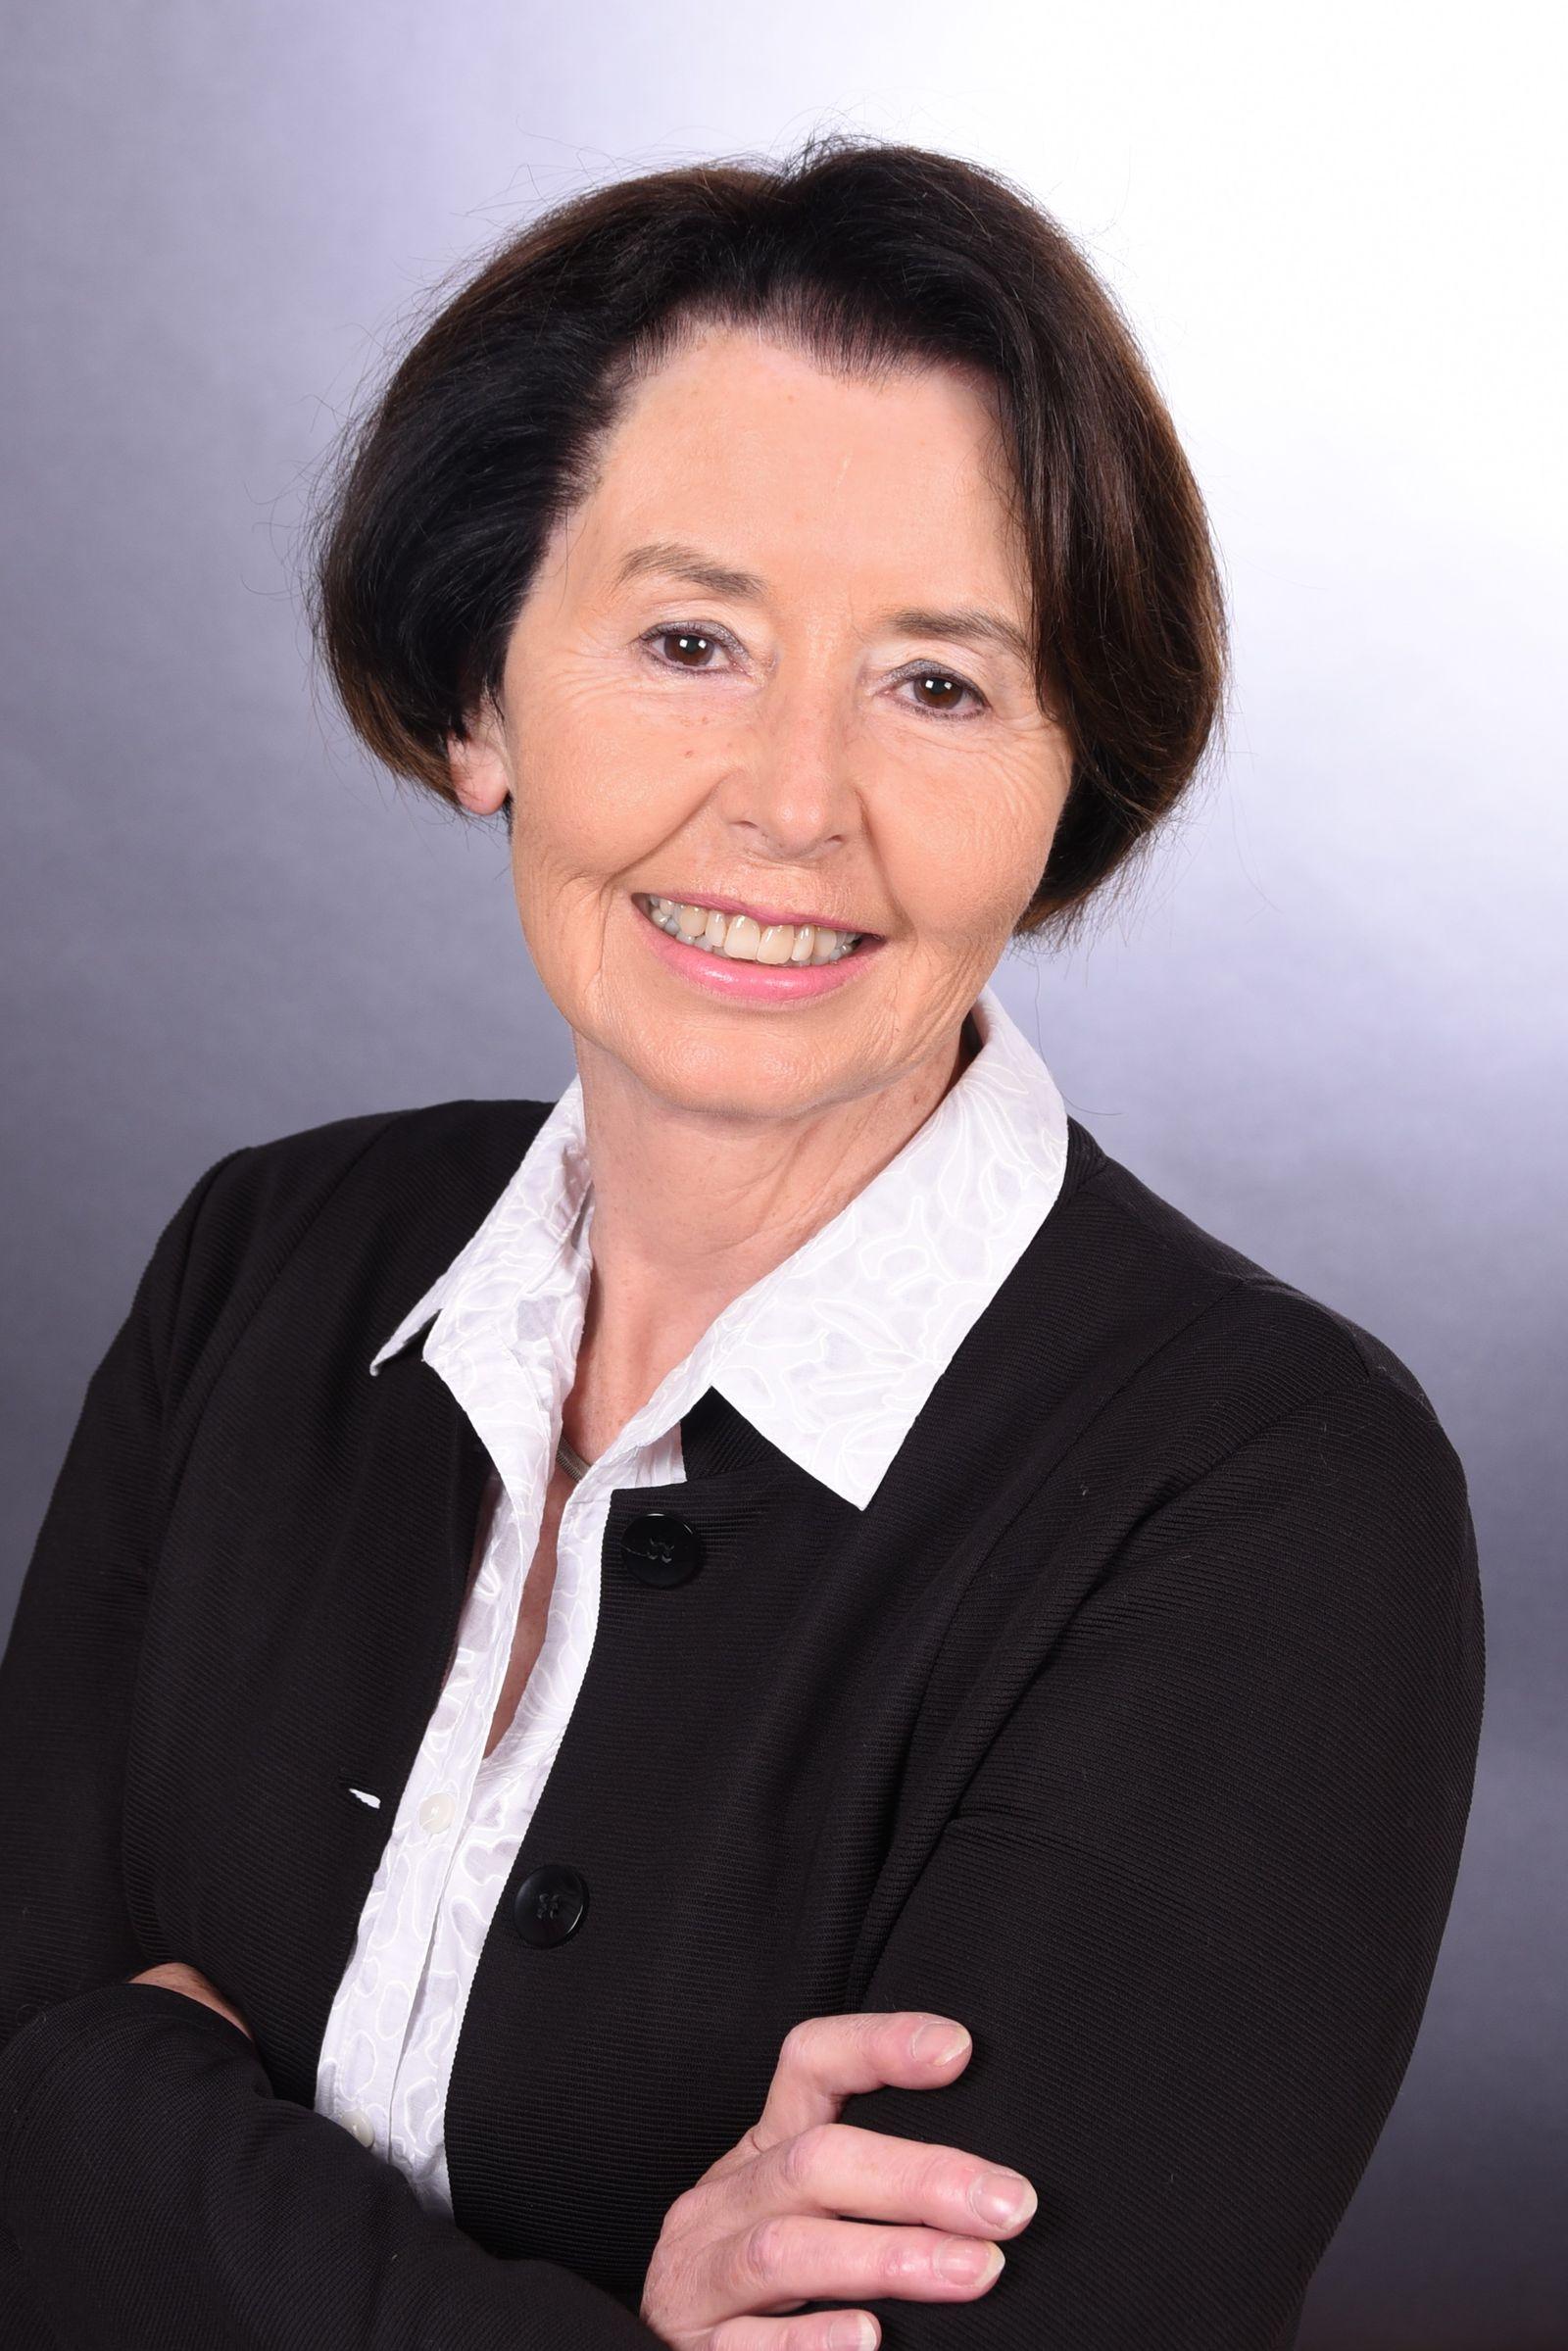 Monika Schliffke